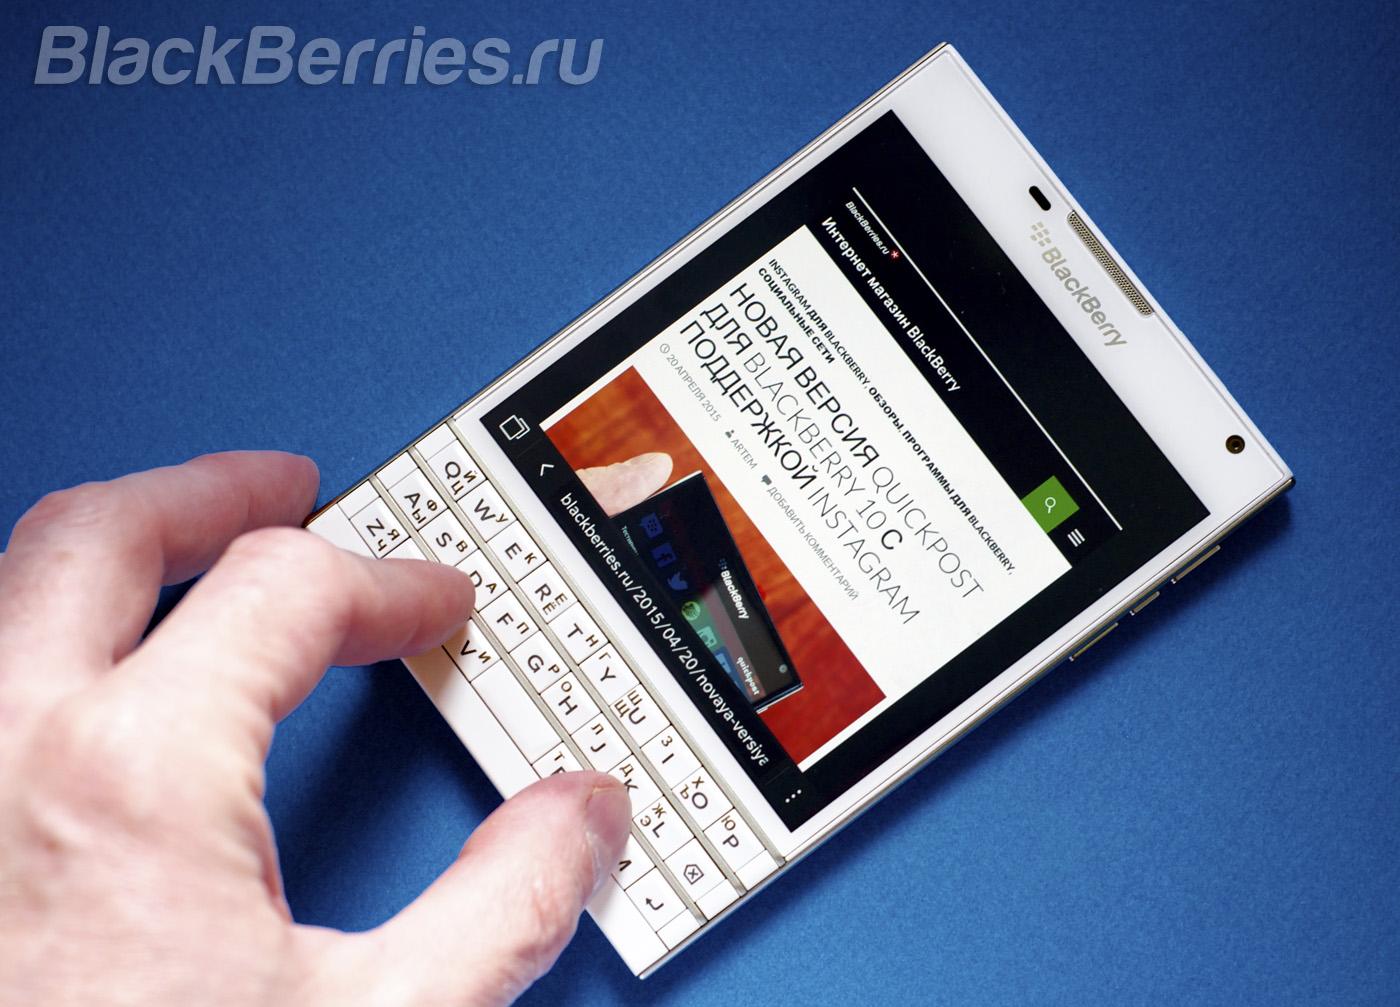 BlackBerry-Passport-10-3-2-5002